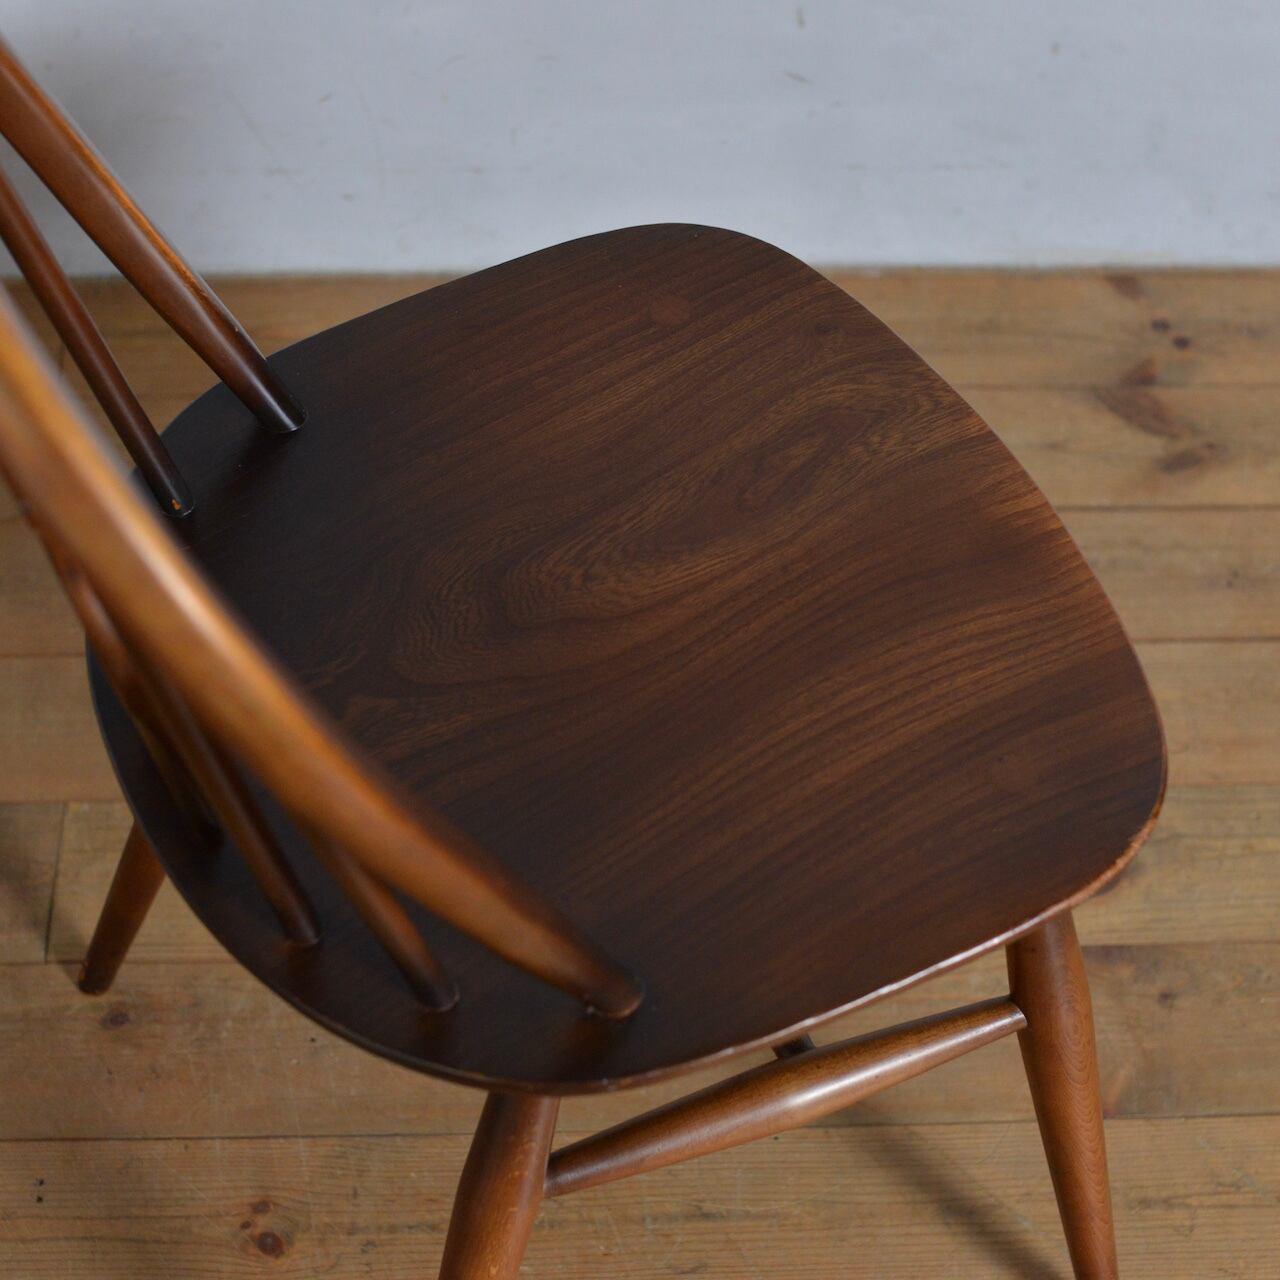 Ercol Thistleback Chair 【B】 / アーコール シスルバック チェア 〈ダイニングチェア・デスクチェア・椅子・コロニアル〉SB2101-0003 【B】